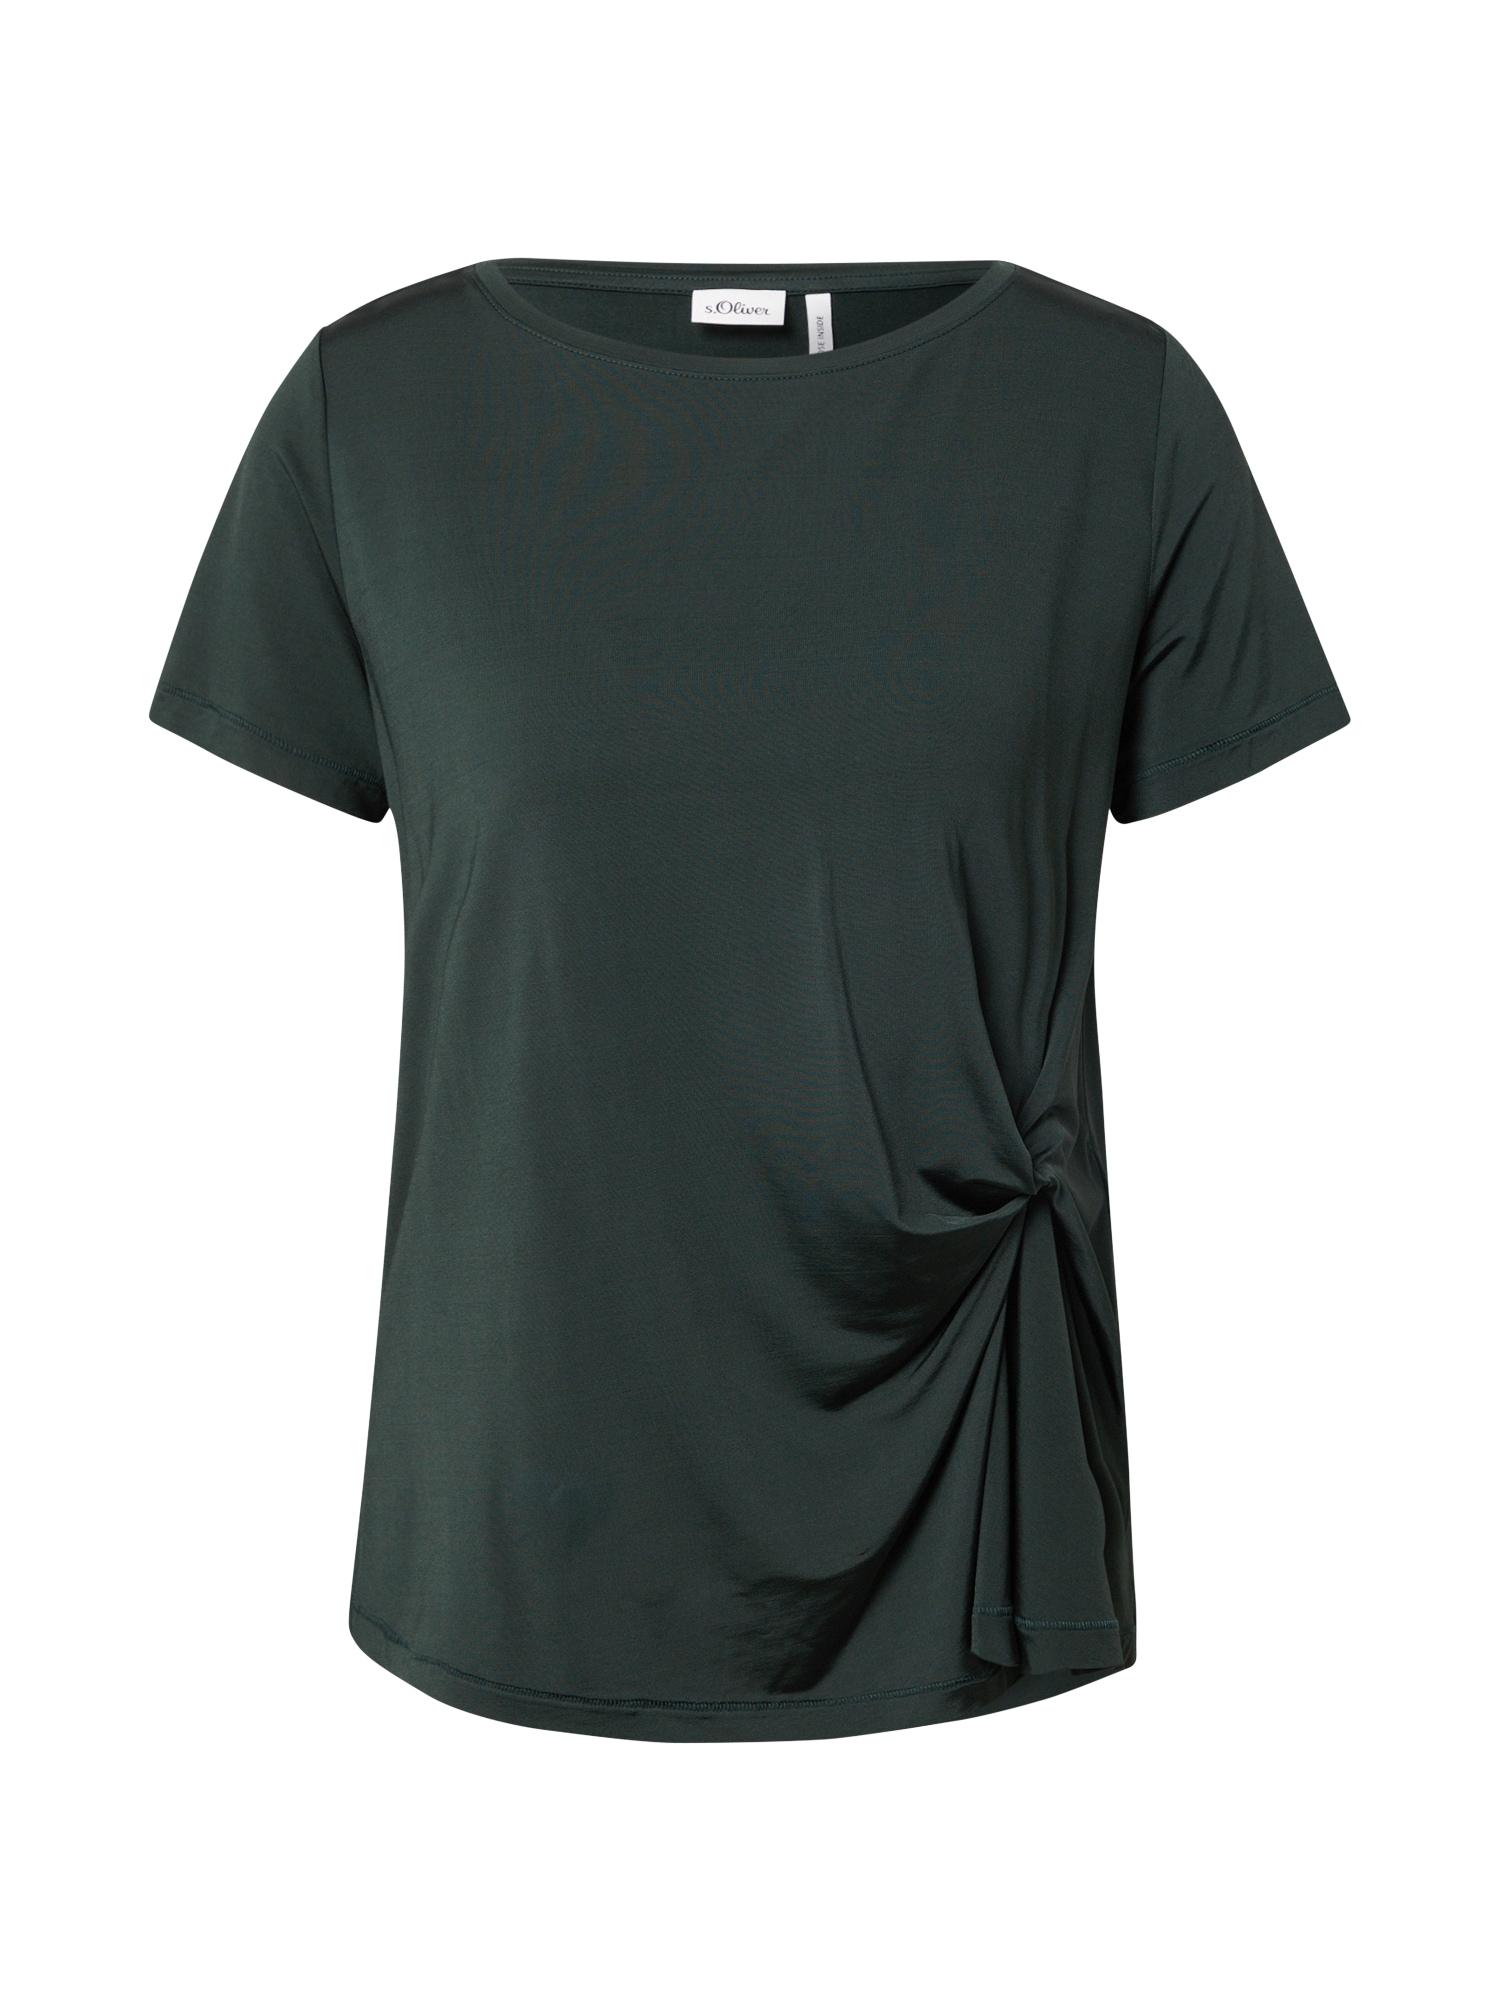 s.Oliver BLACK LABEL Marškinėliai įdegio spalva